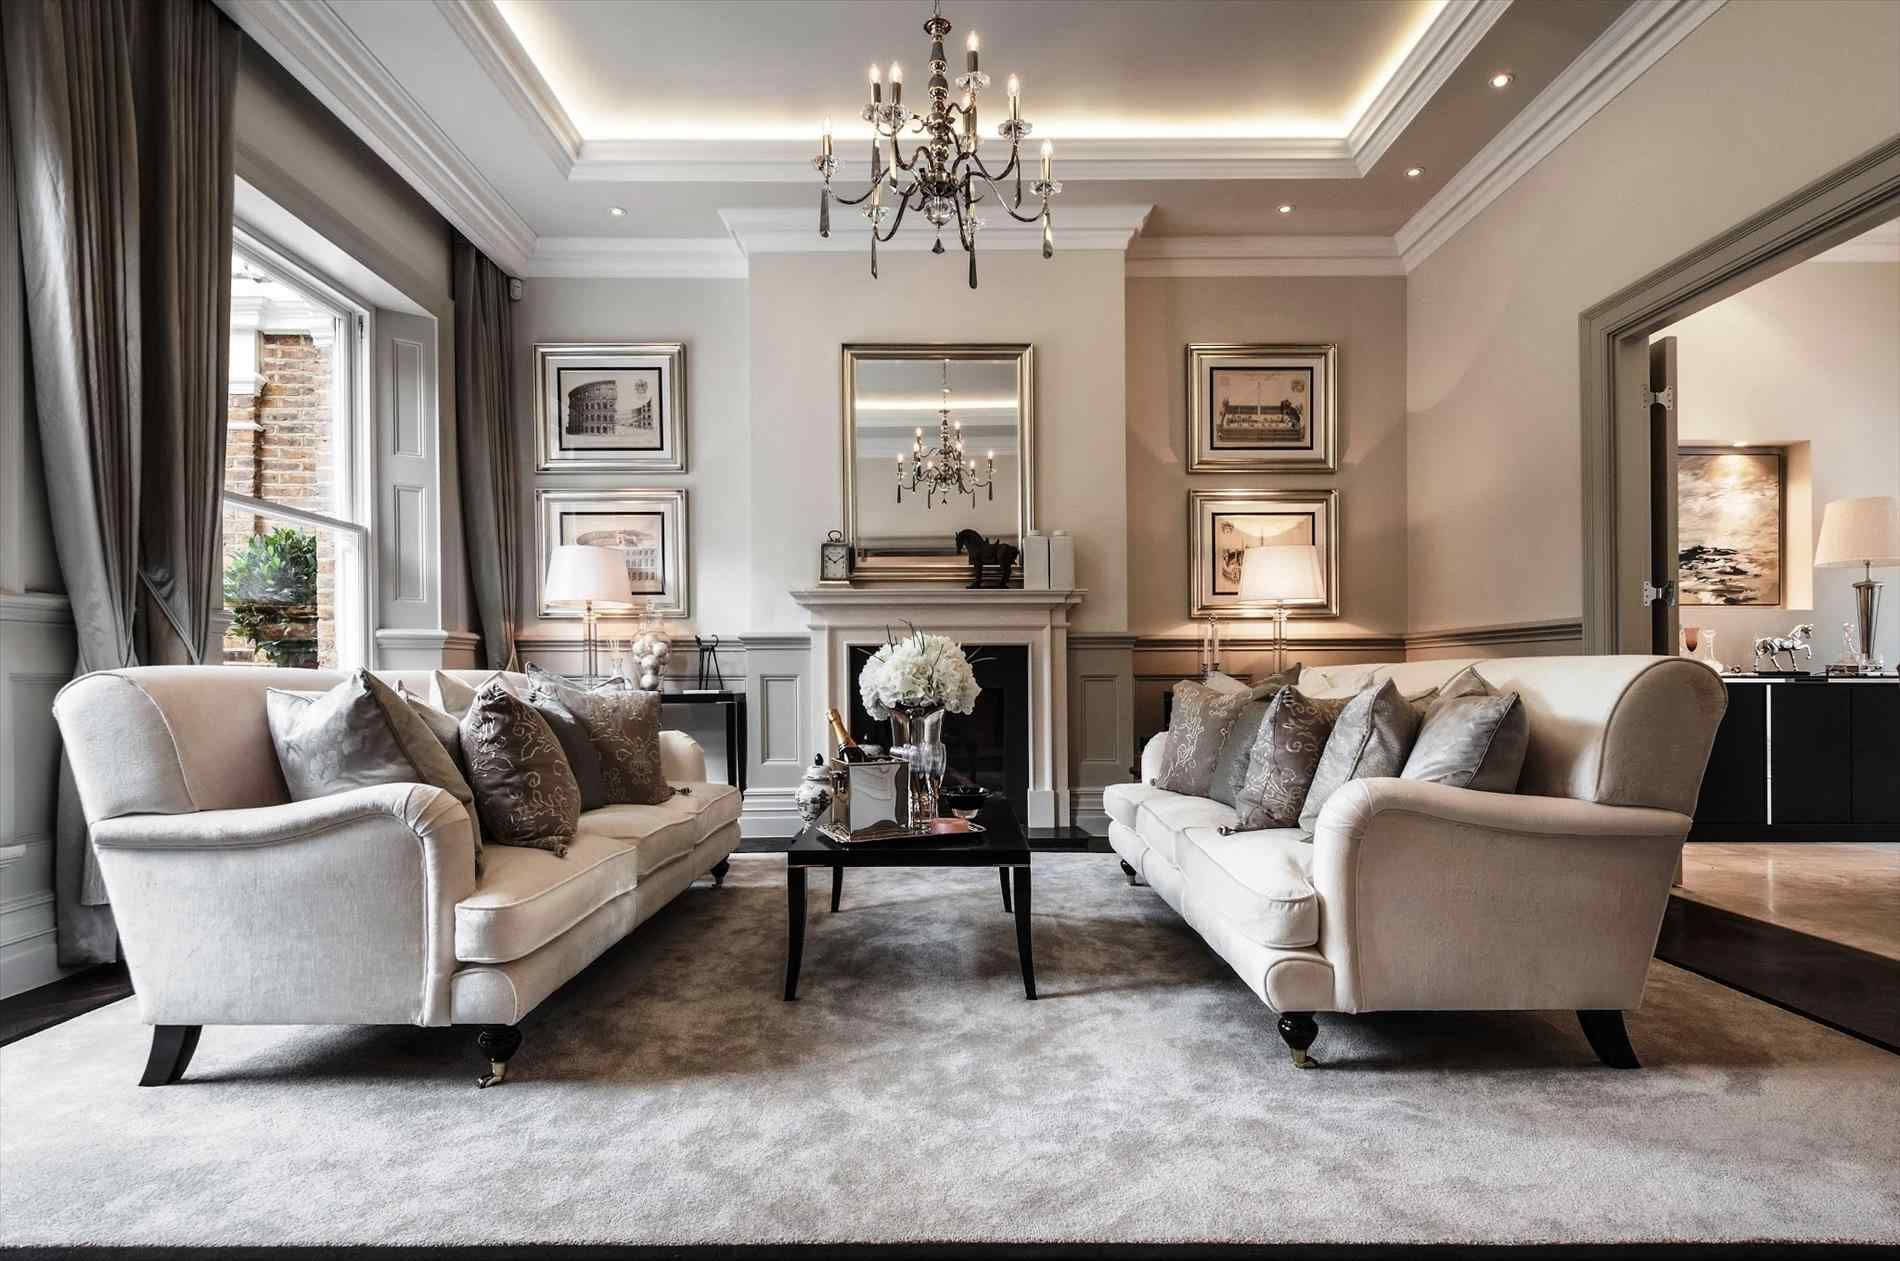 image result for modern traditional living room fresh clean rh pinterest com modern traditional living room designs modern traditional living room ideas